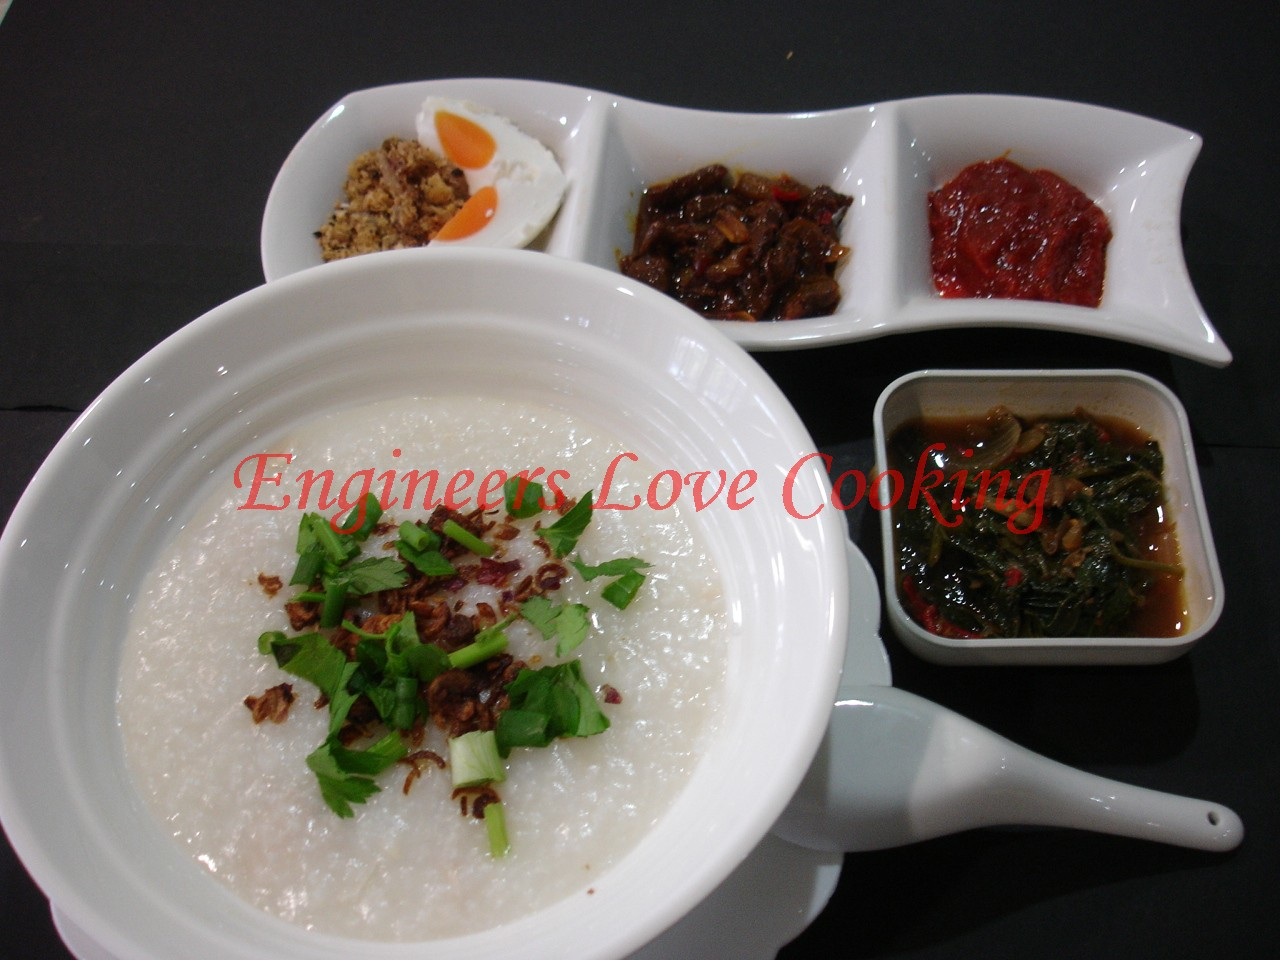 Engineers Love Cooking: BUBUR NASI AYAM / HOMEMADE CHICKEN PORRIDGE